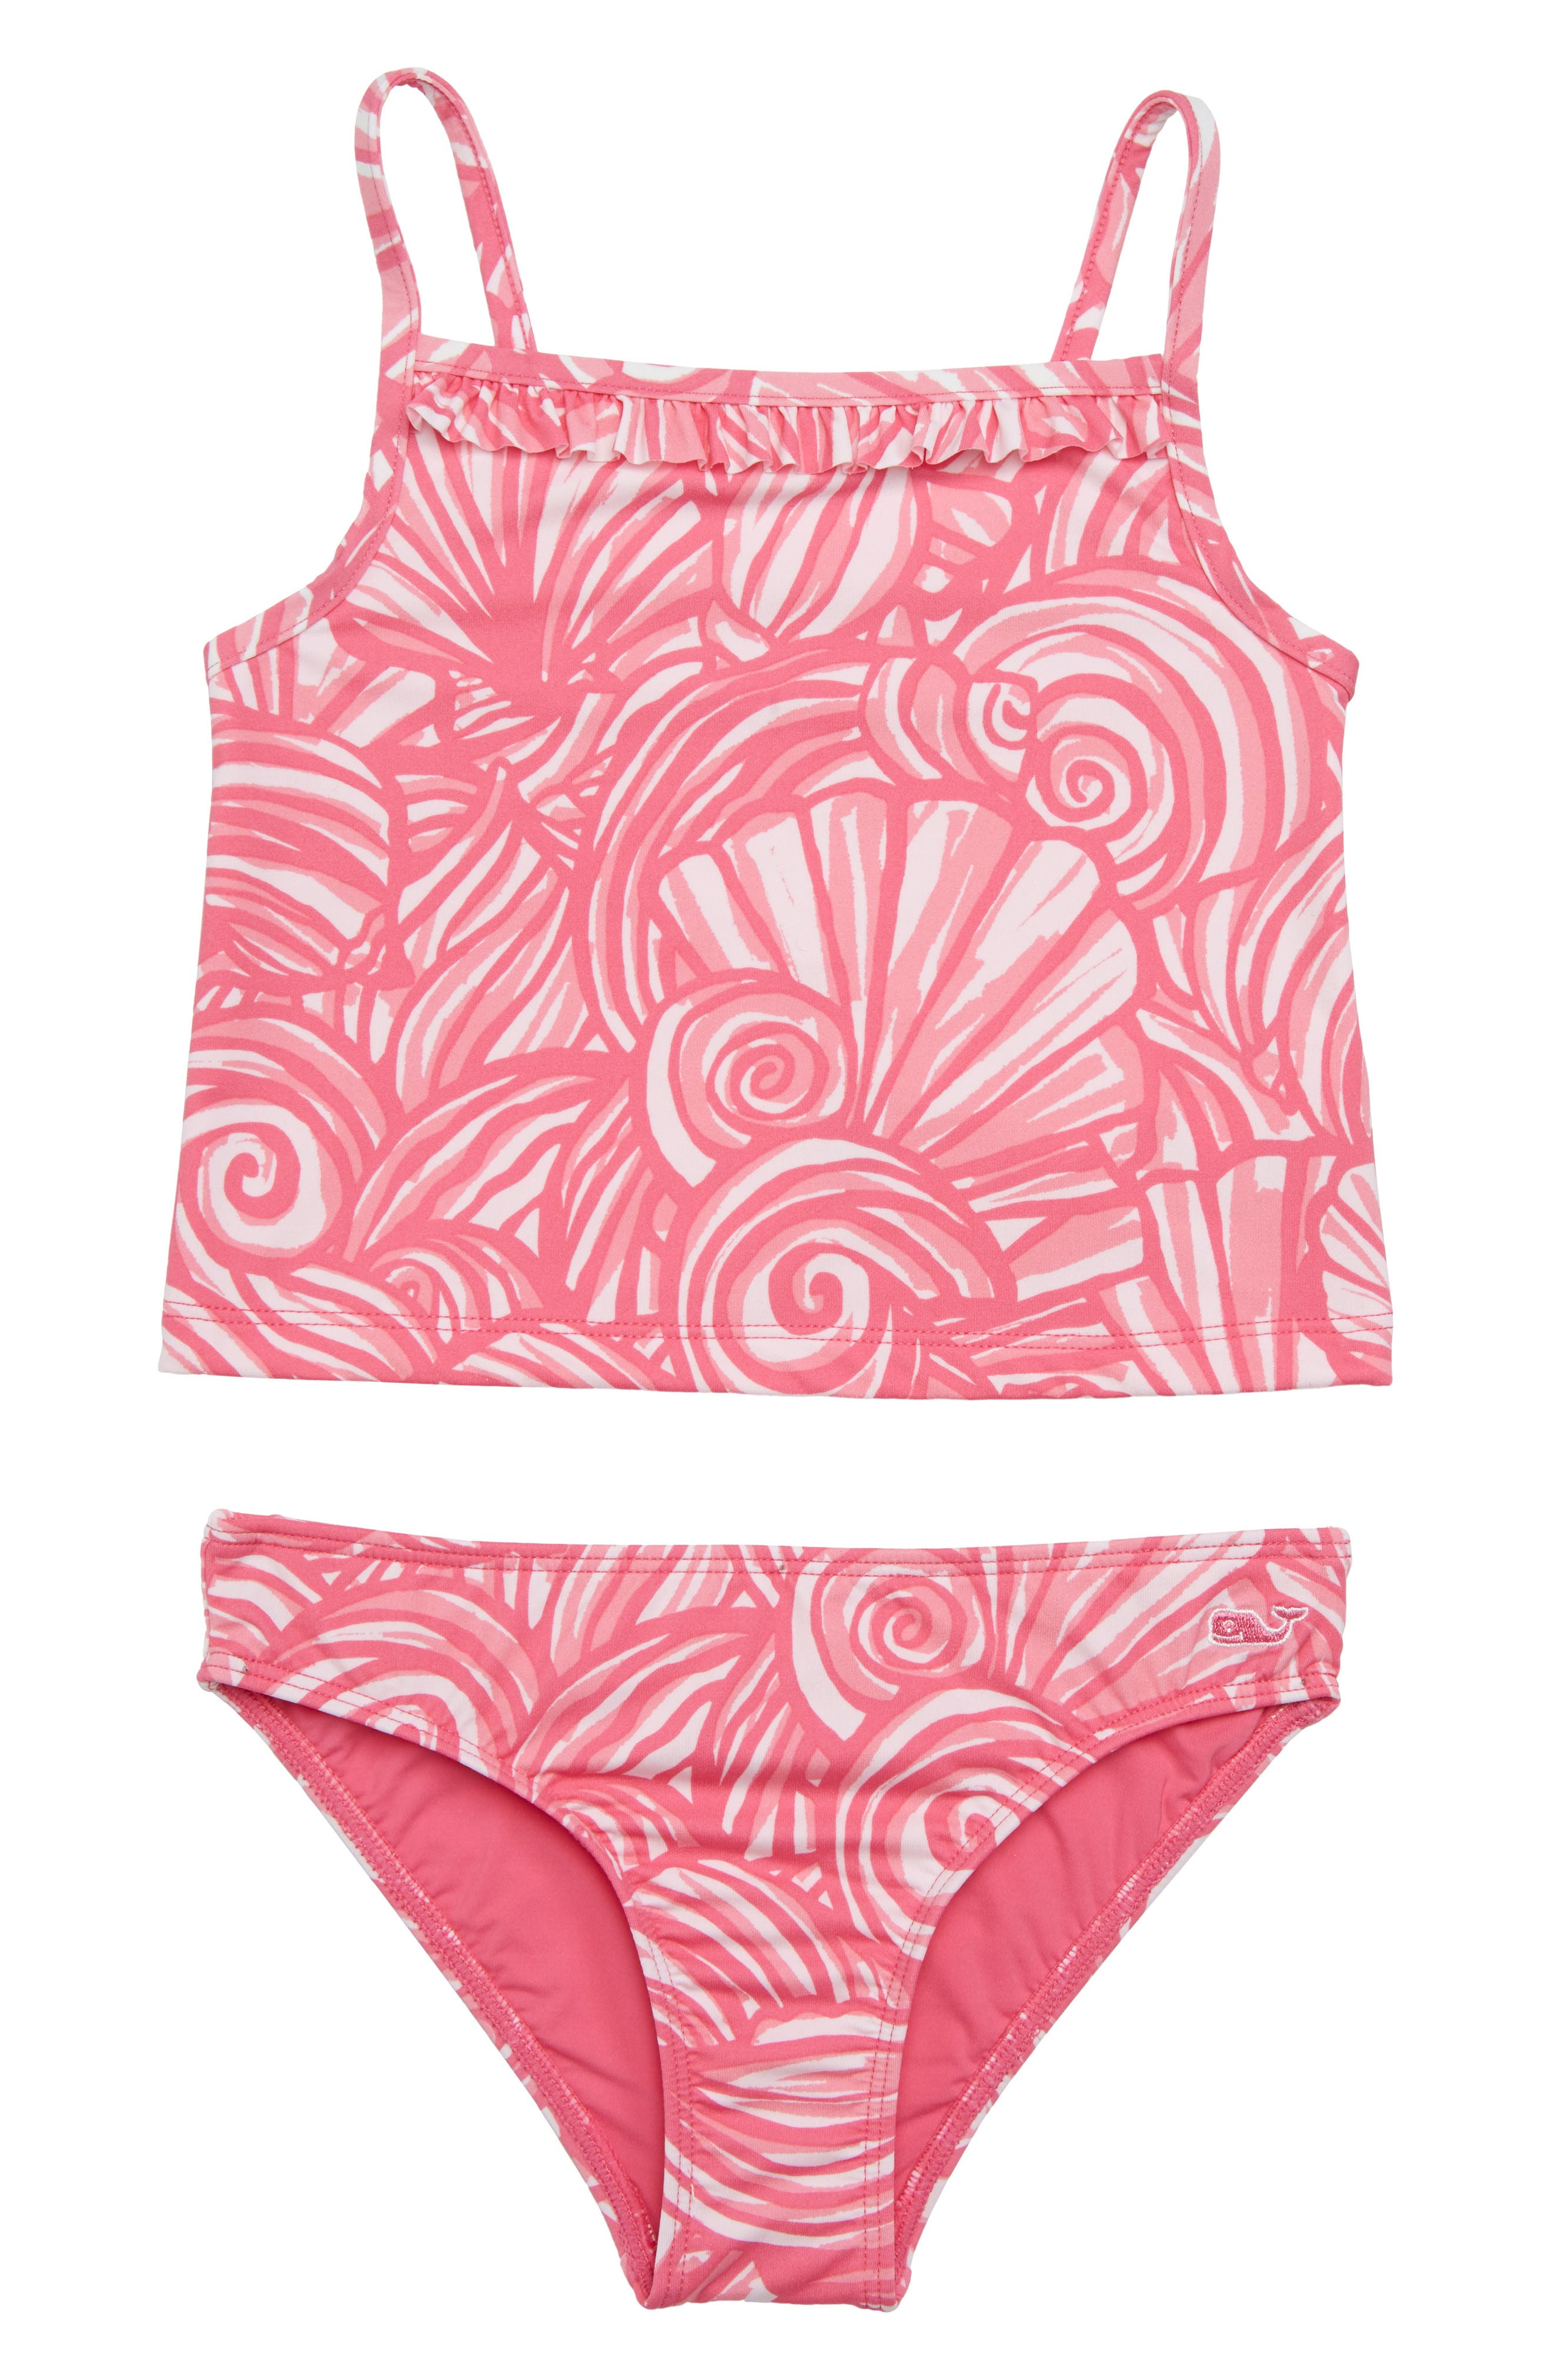 Shell Two-Piece Tankini Swimsuit,                             Main thumbnail 1, color,                             Sweet Taffy